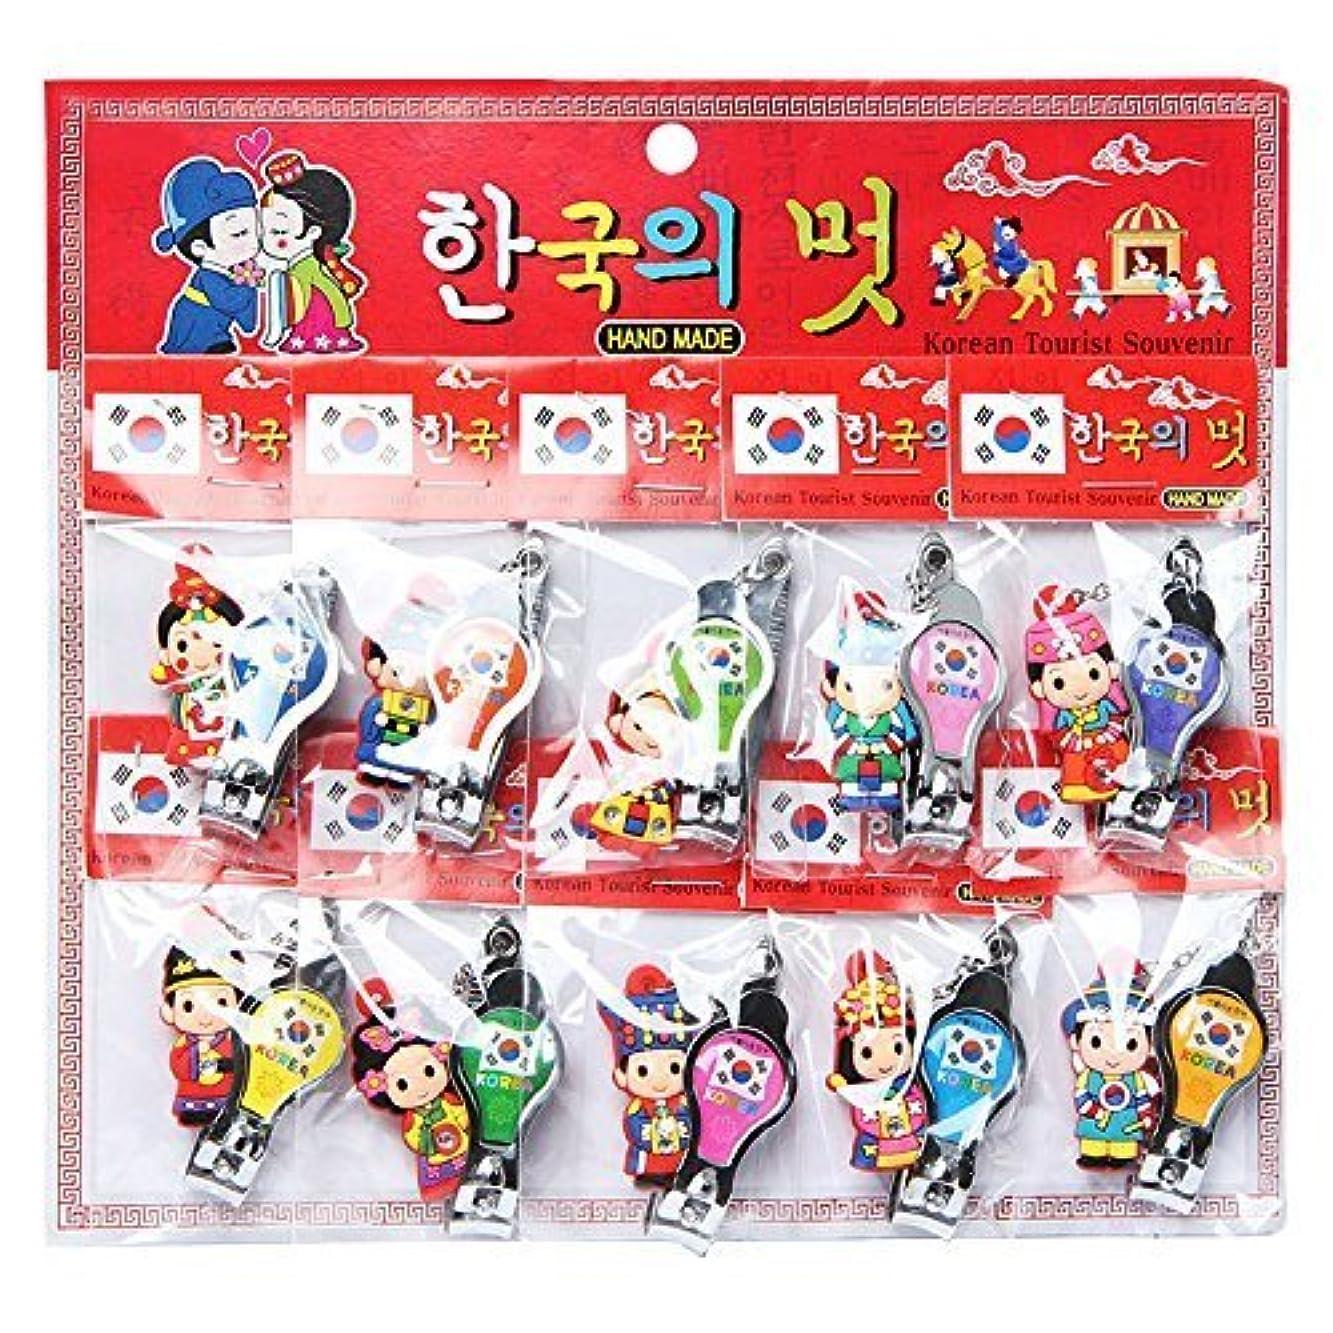 KOREA style Nail clippers / 韓国のお土産ギフト [並行輸入品]